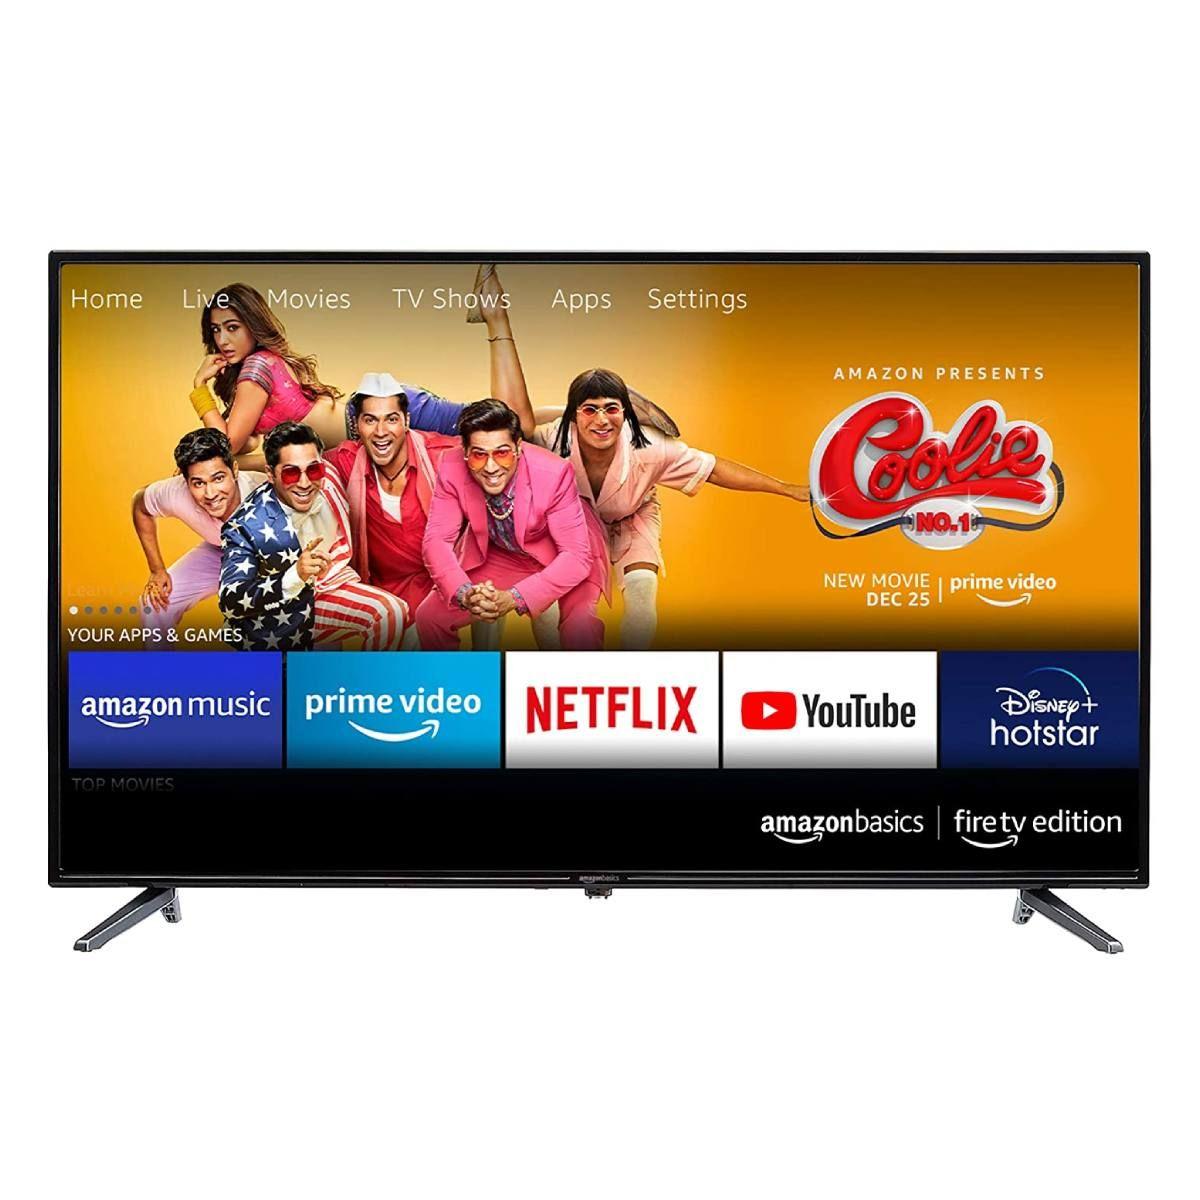 AmazonBasics Fire TV Edition 32-inch HD Ready LED TV